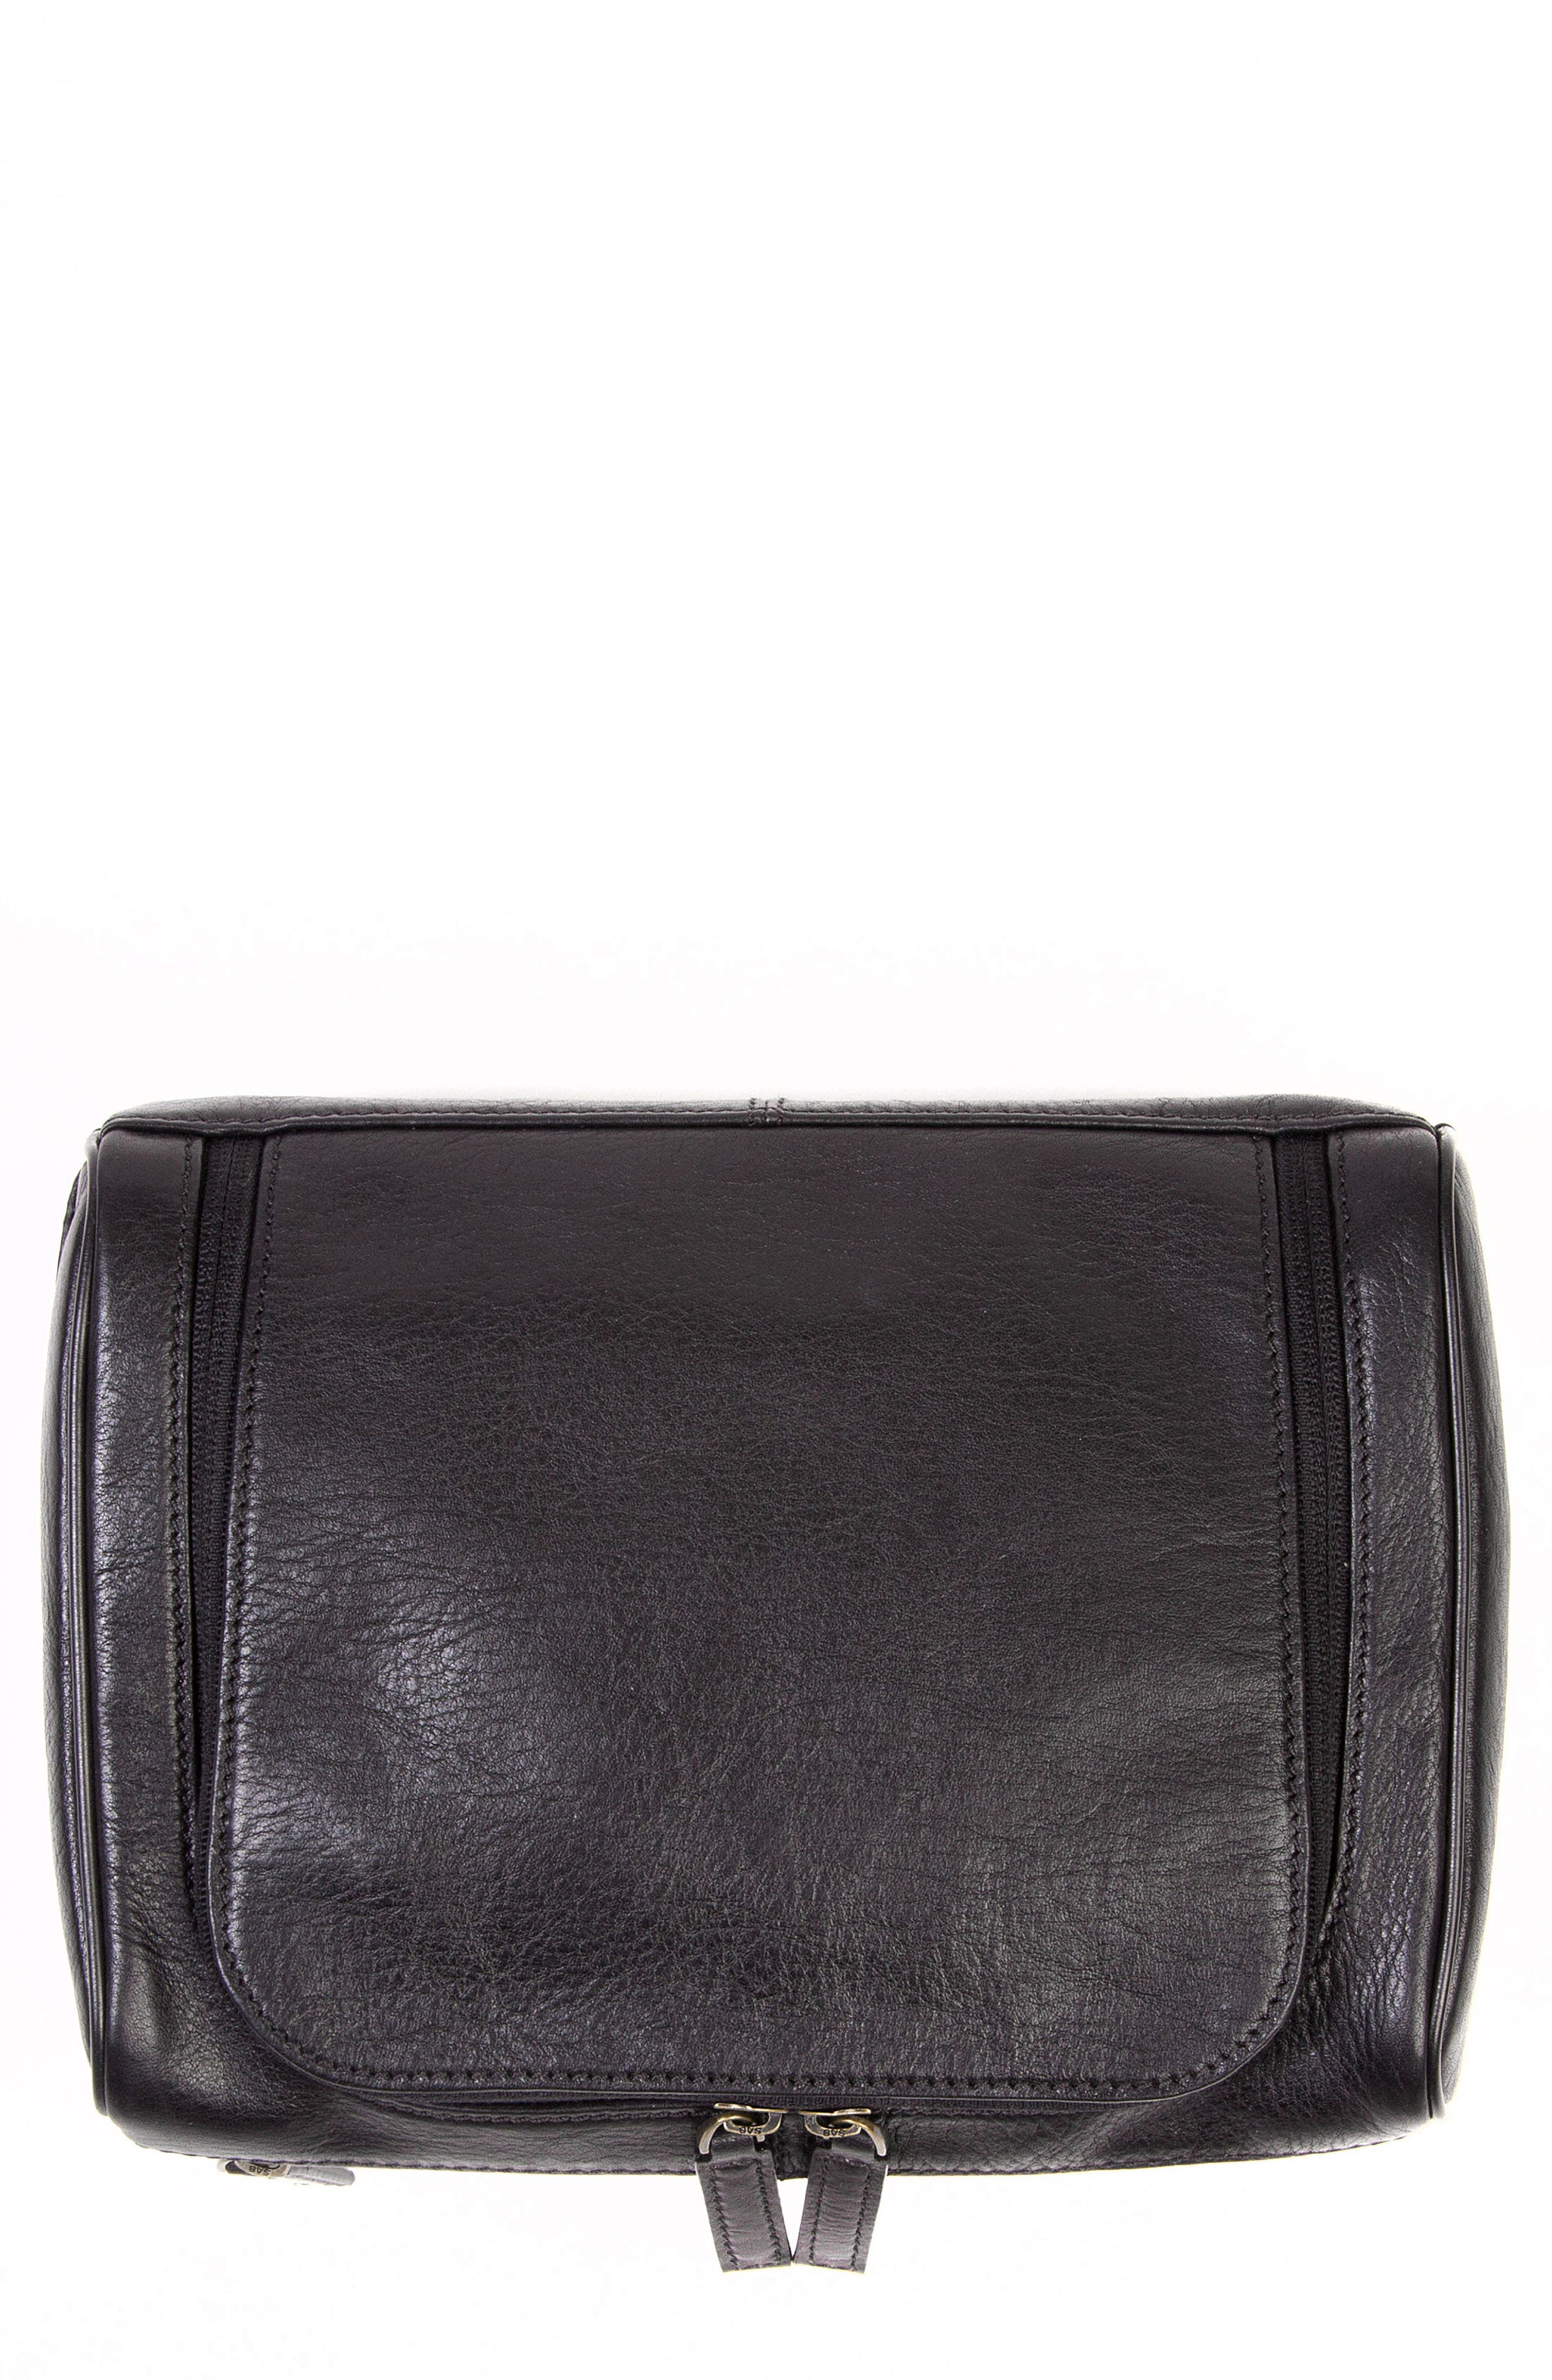 Becker Leather Travel Kit,                         Main,                         color, BLACK